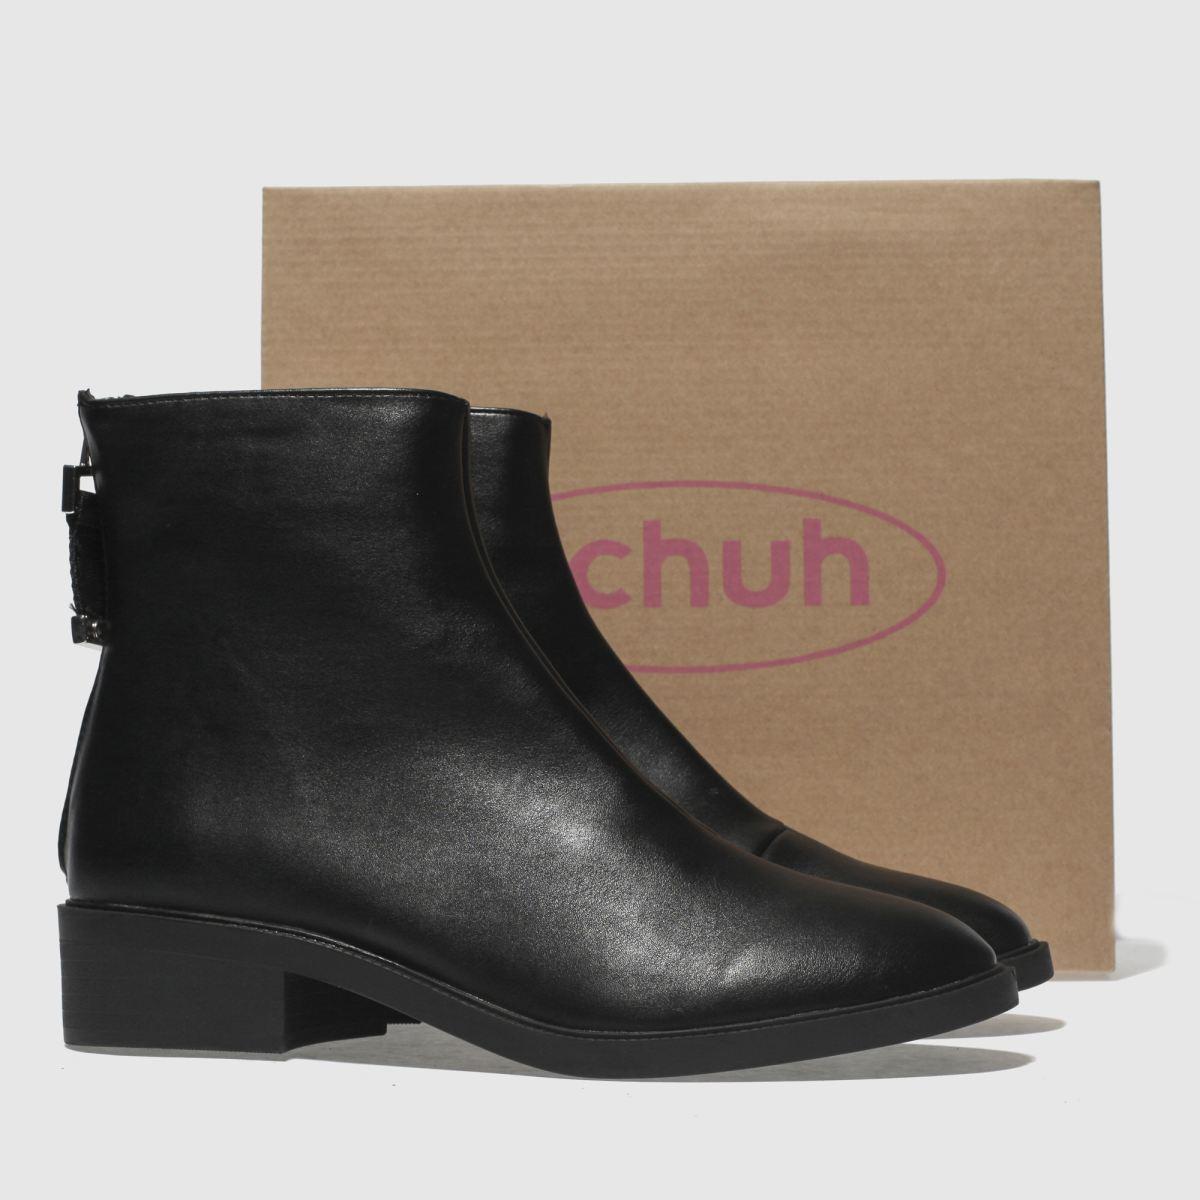 Damen Schwarz Gute schuh Empowerment Boots   schuh Gute Schwarz Qualität beliebte Schuhe eacb85